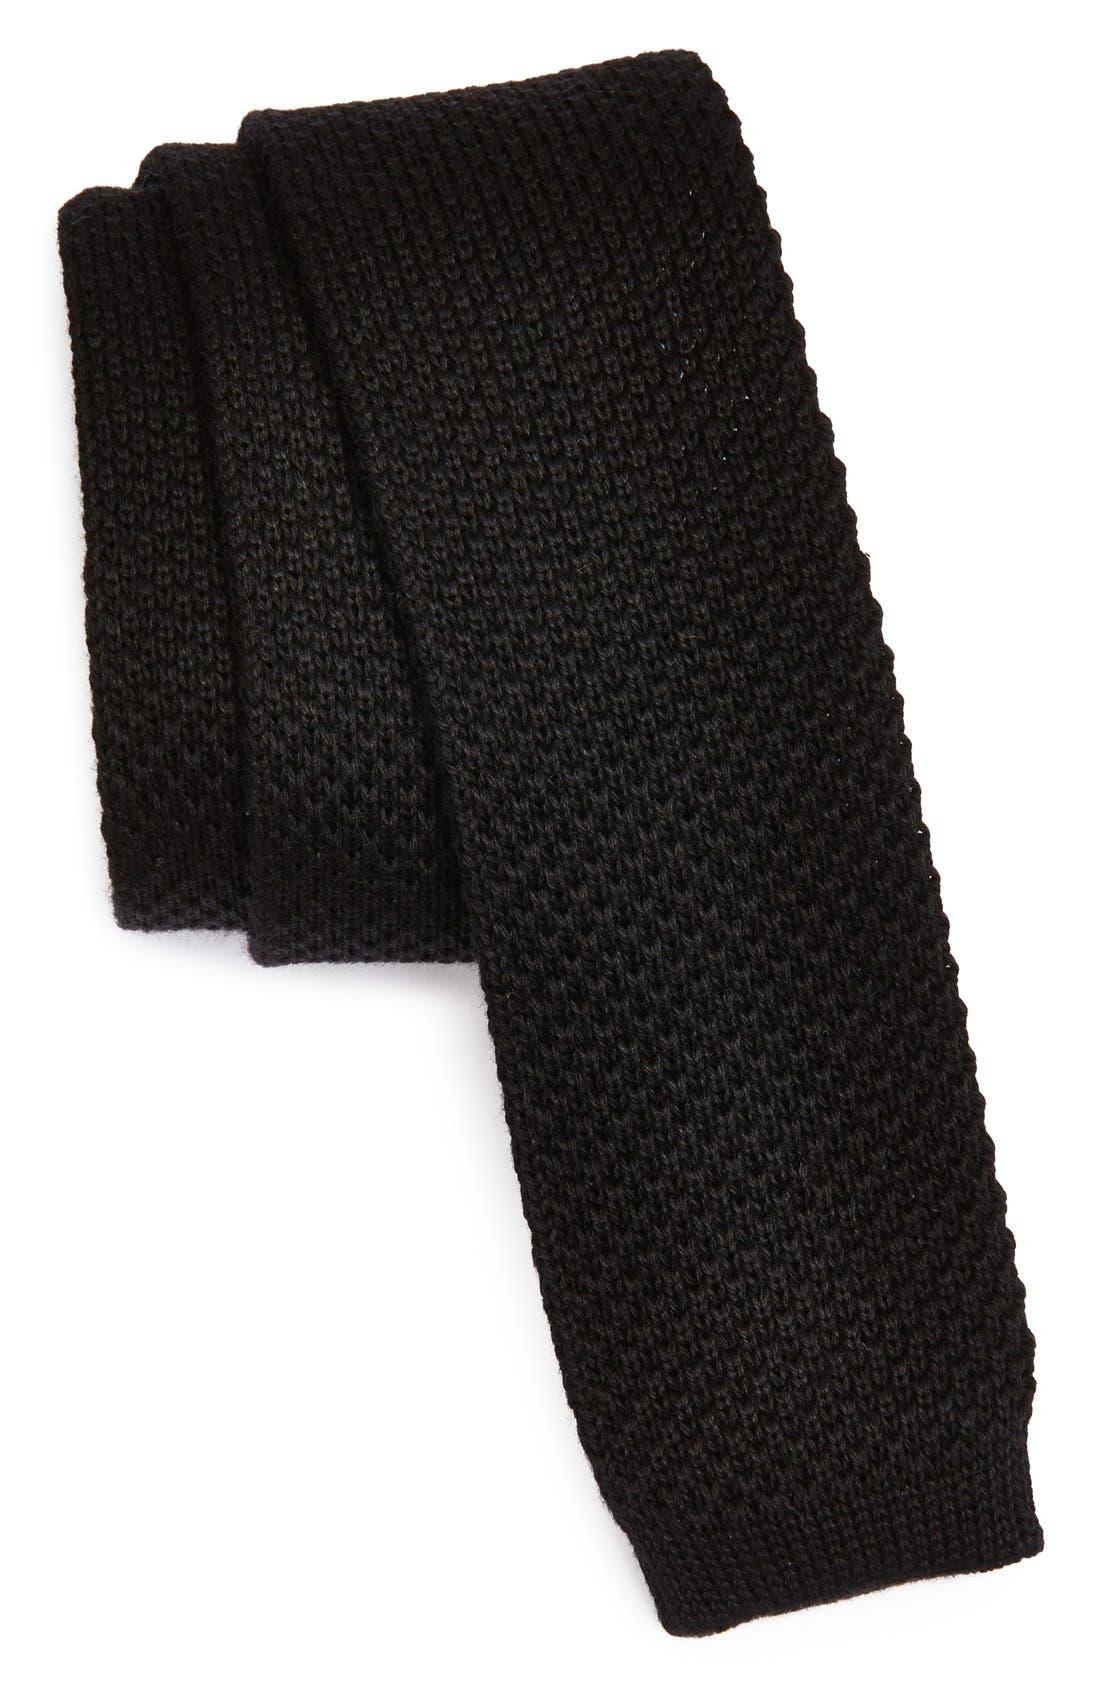 Main Image - BOSS HUGO BOSS Knit Cotton Tie